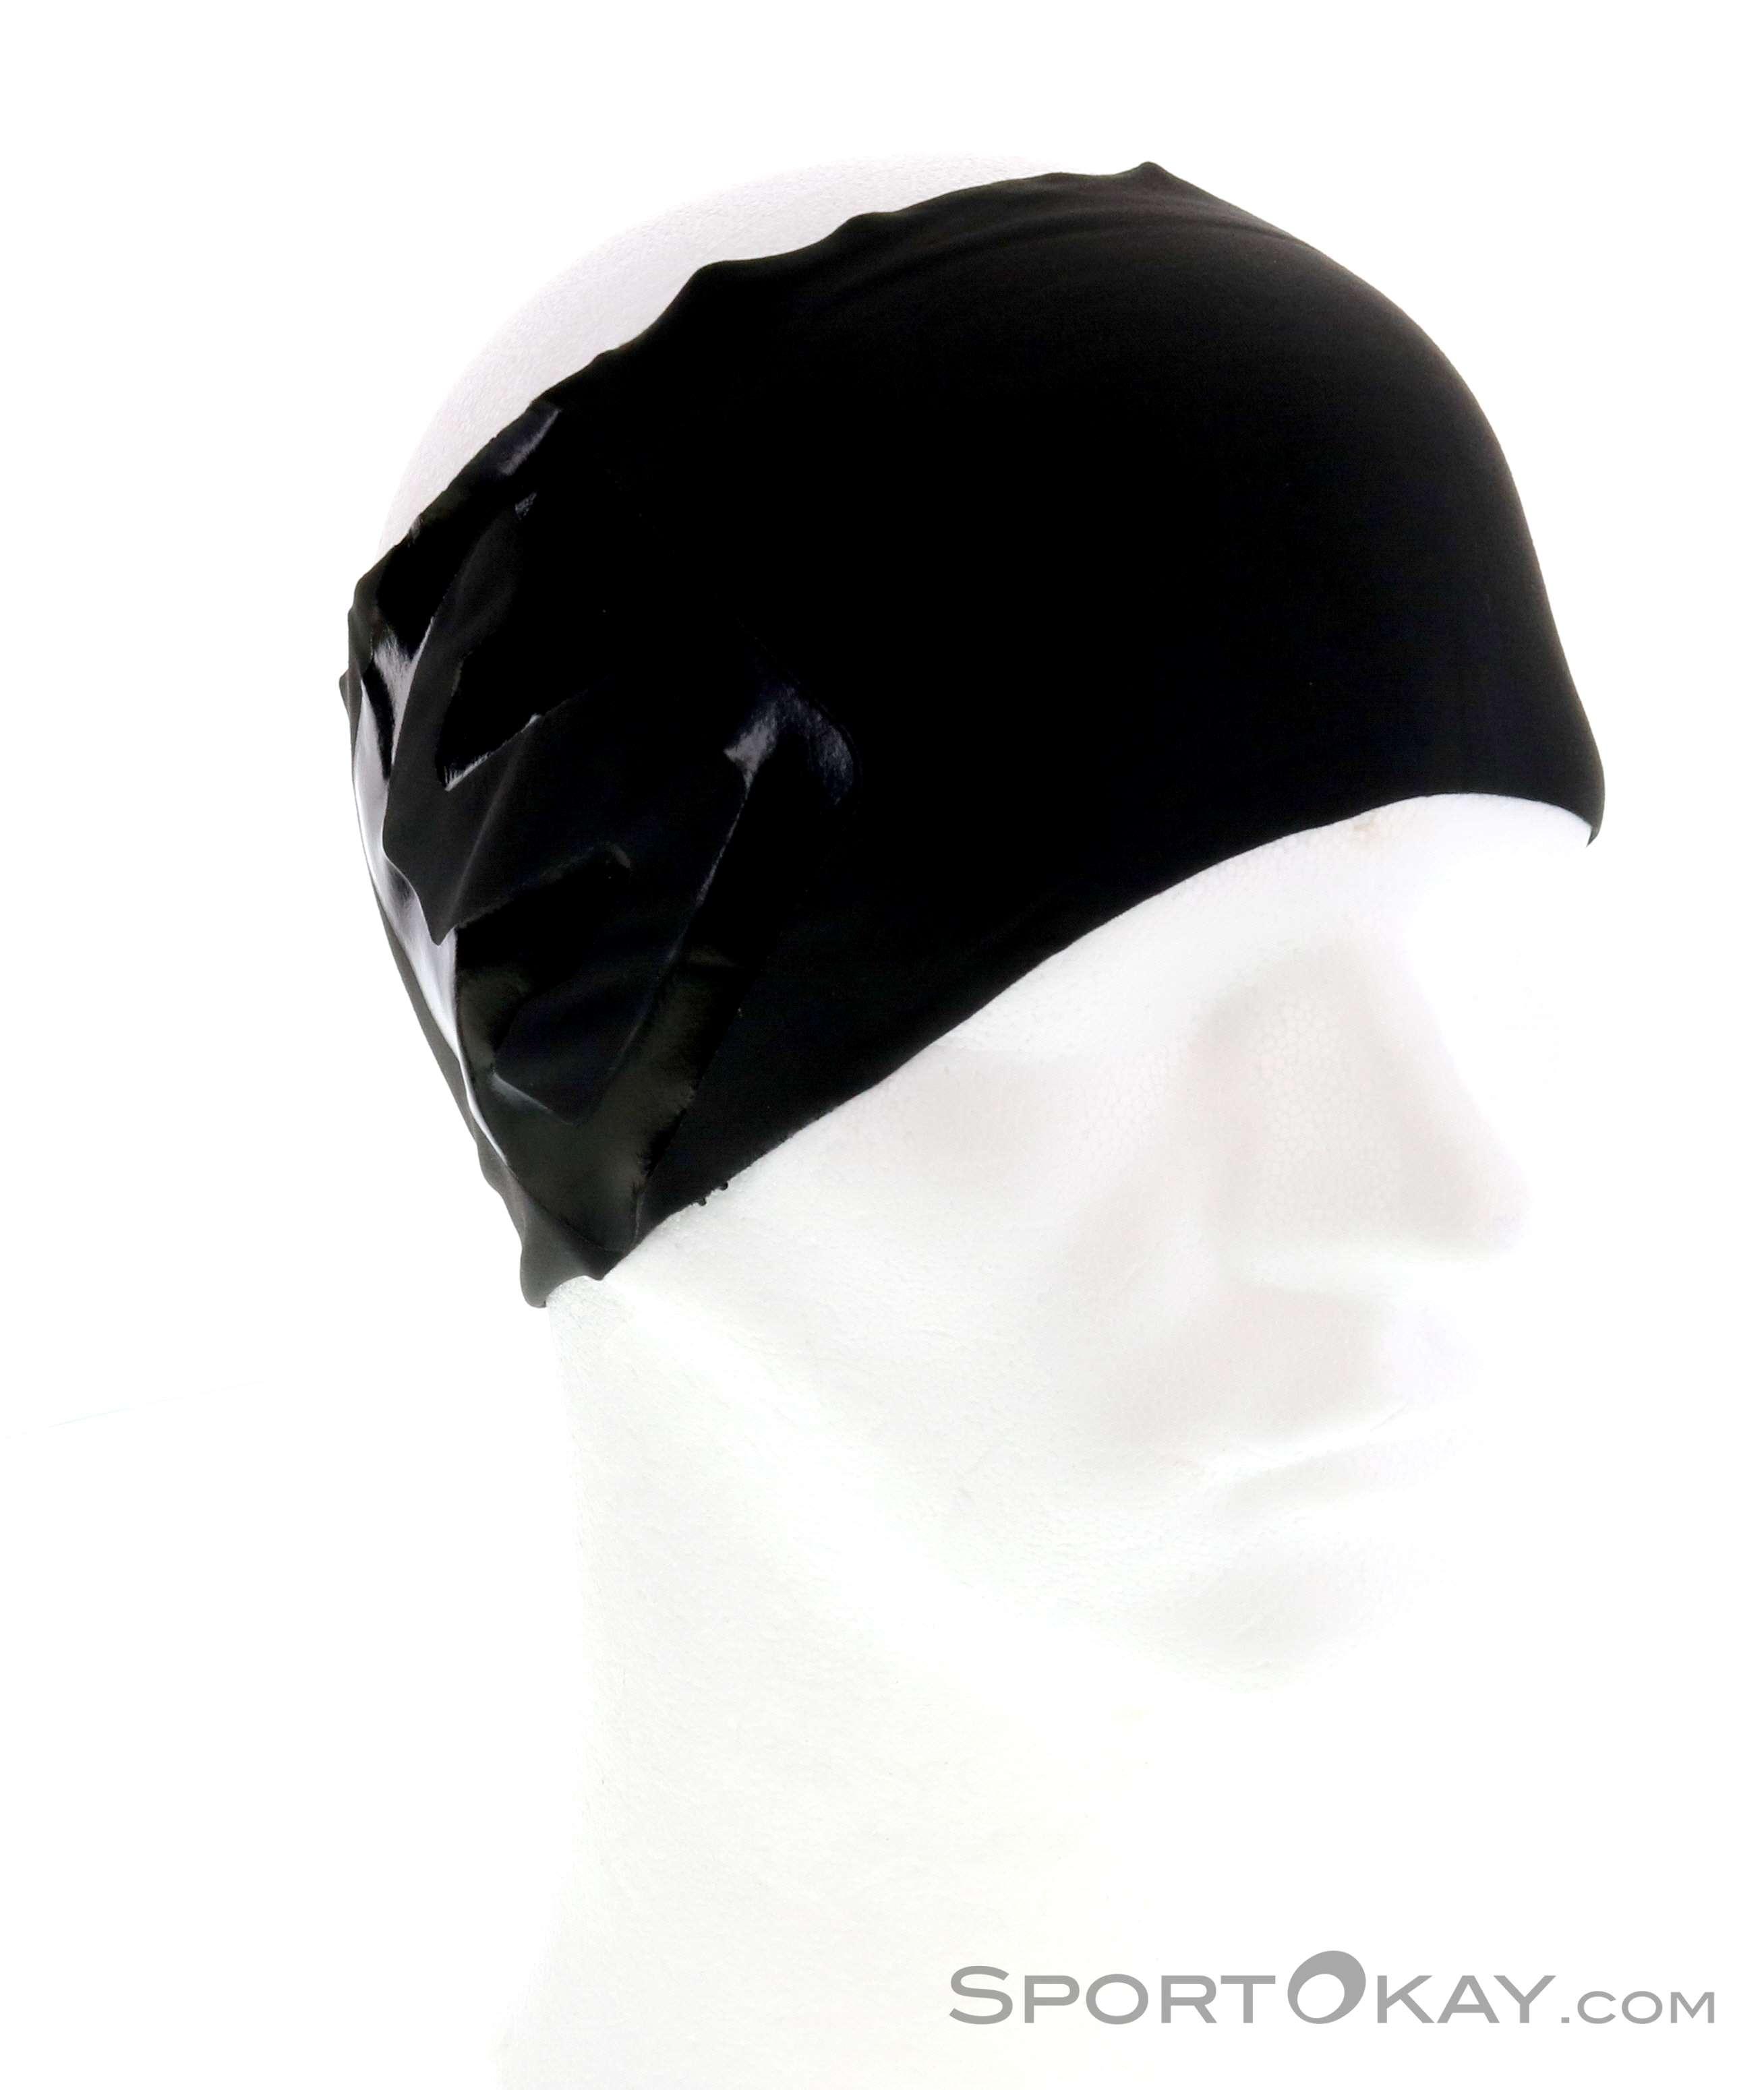 Salomon RS Pro Headband - Caps   Headbands - Outdoor Clothing ... 9403a11bee